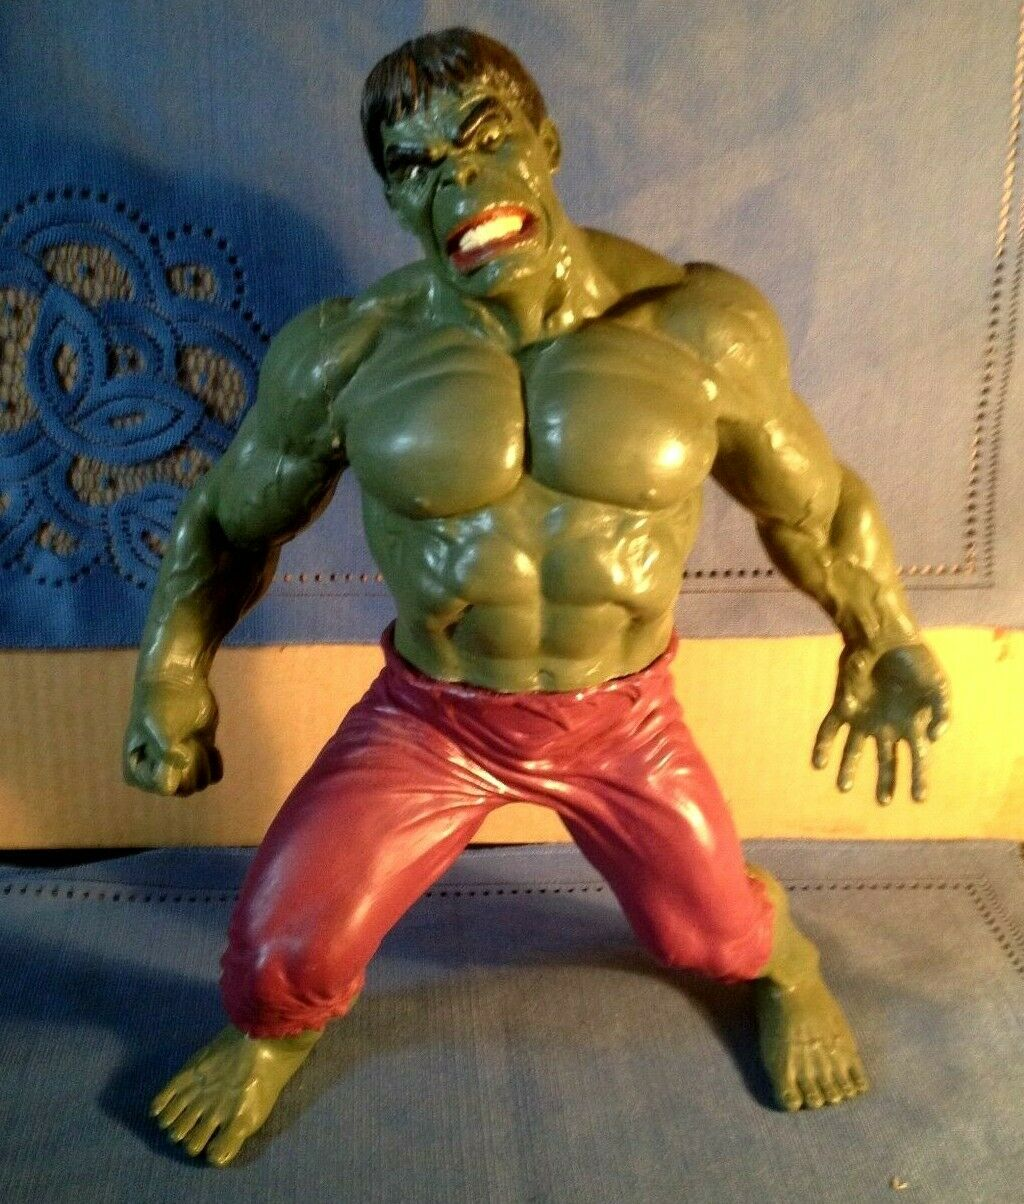 Hulk   -  12 inch Horizon Figure -  Built Model Kit